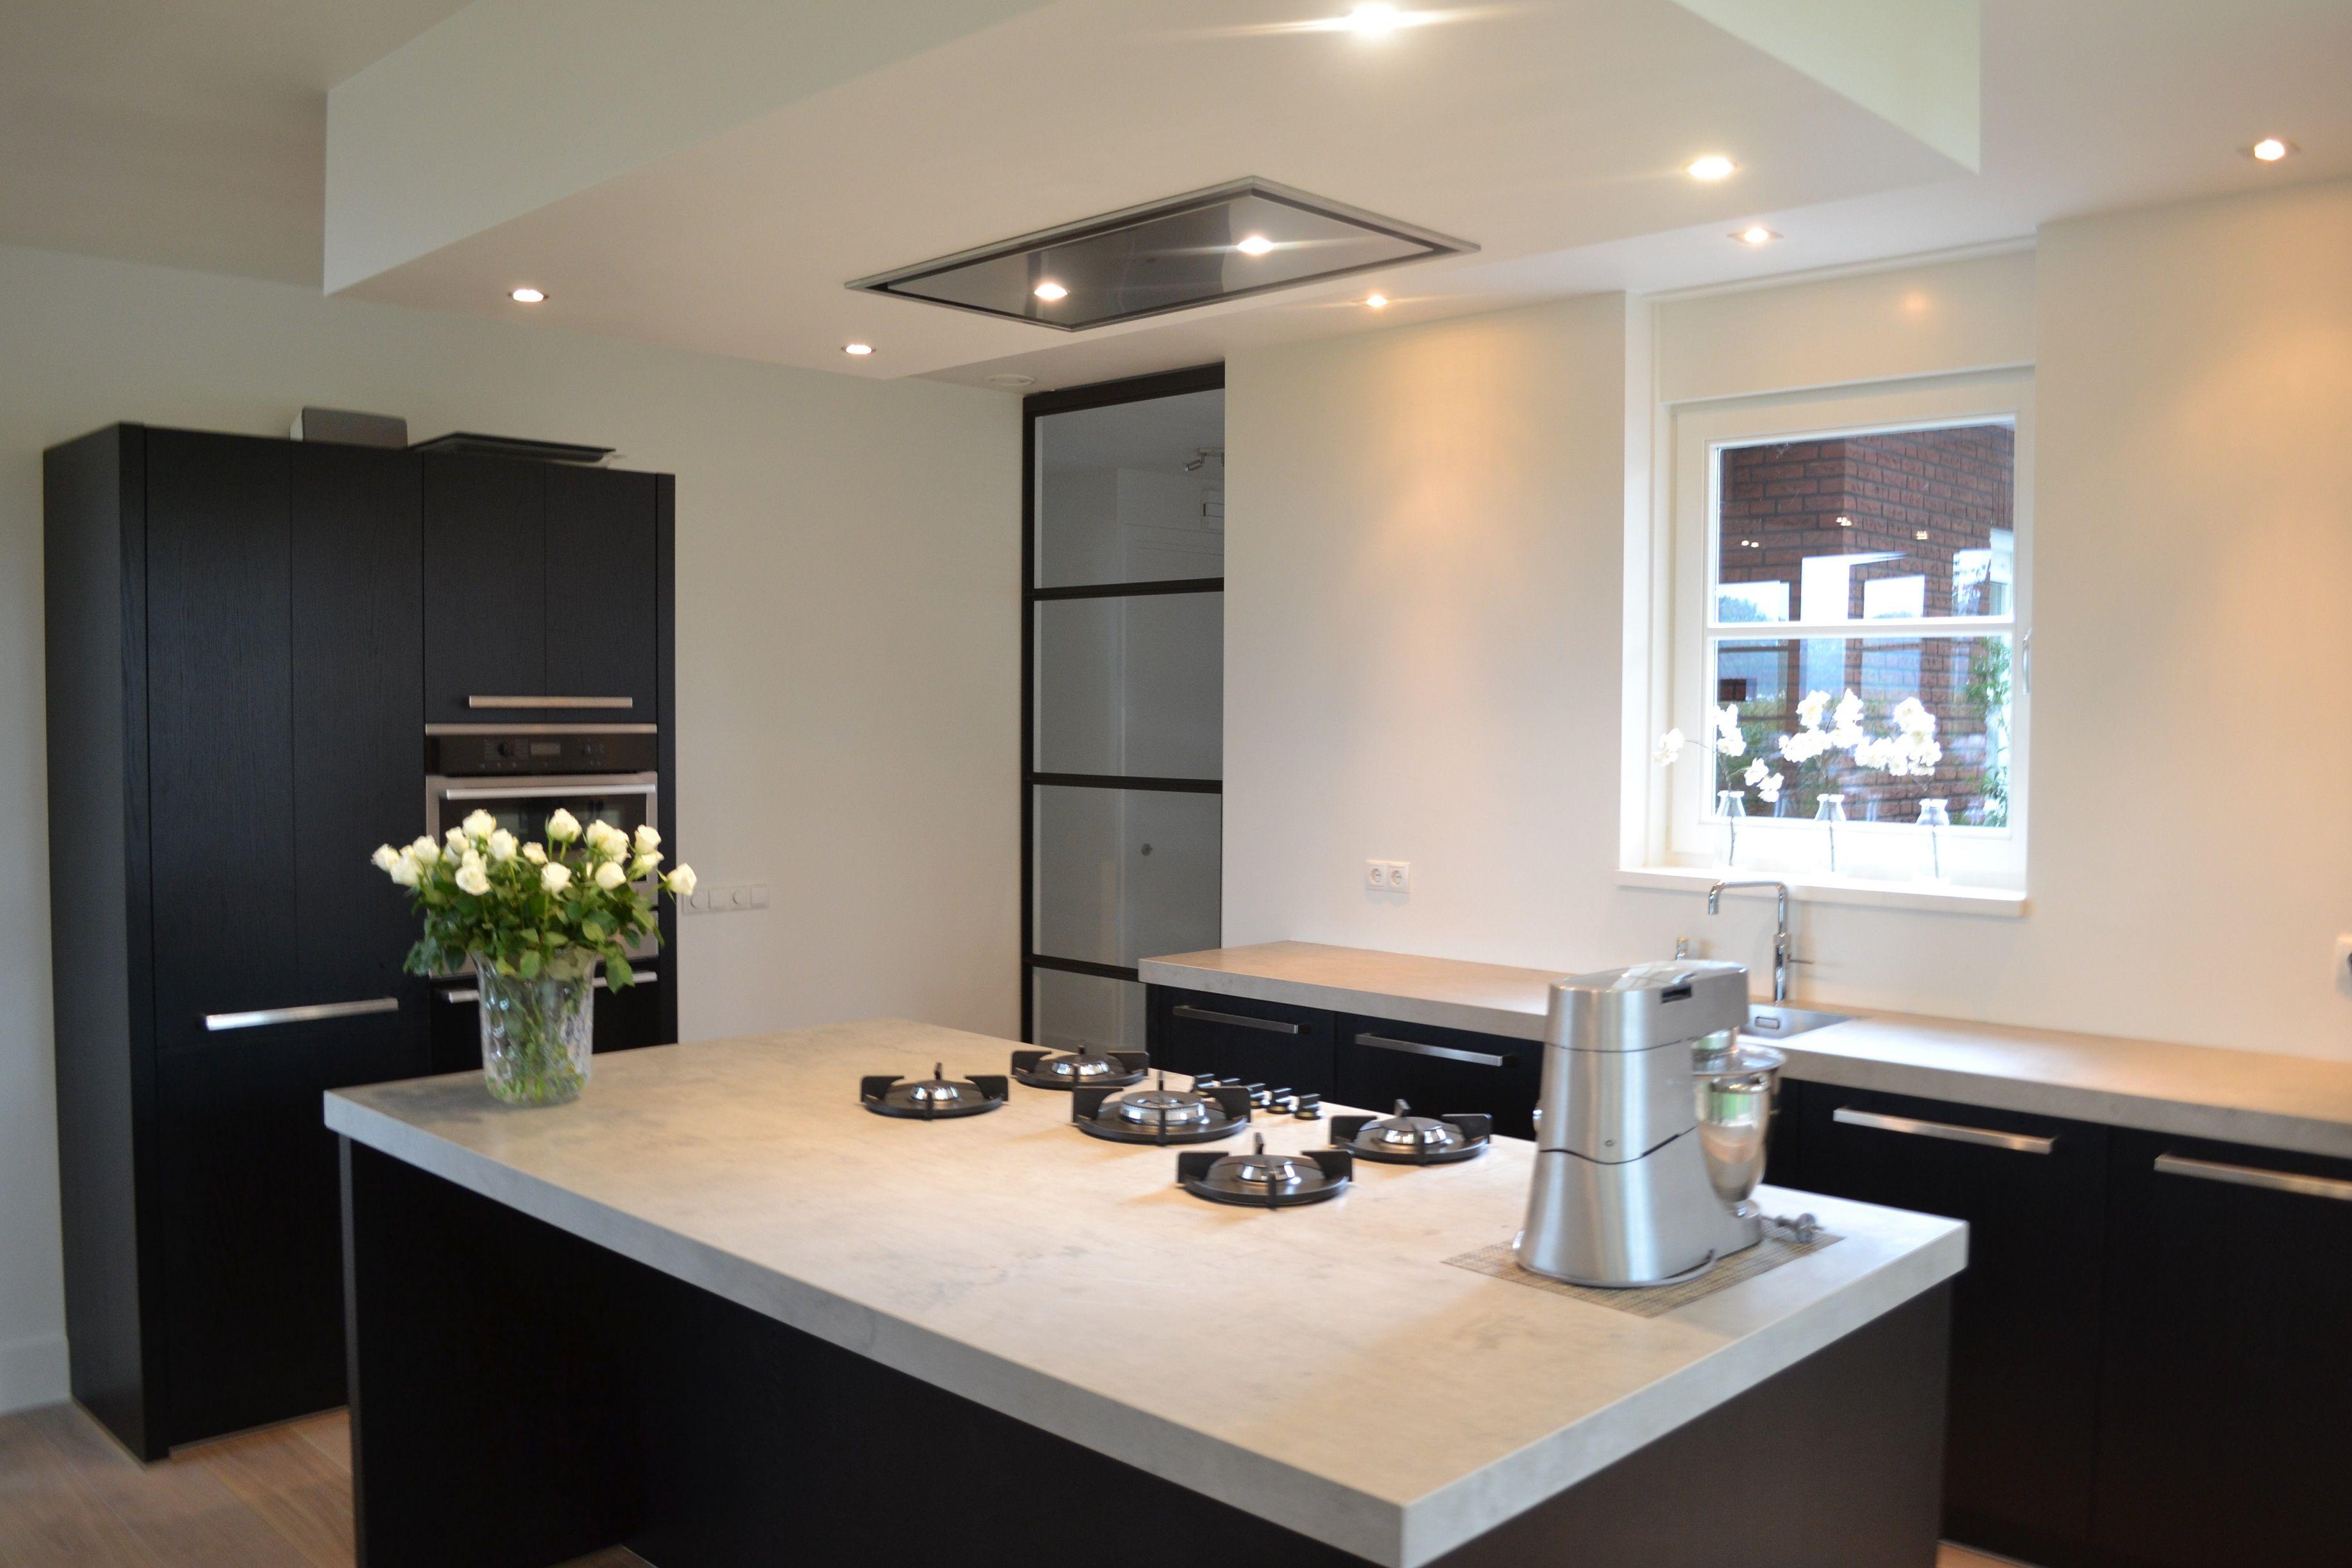 Zwarte eiken fineer keuken met keramiek werkblad in for Werkblad keuken keramiek